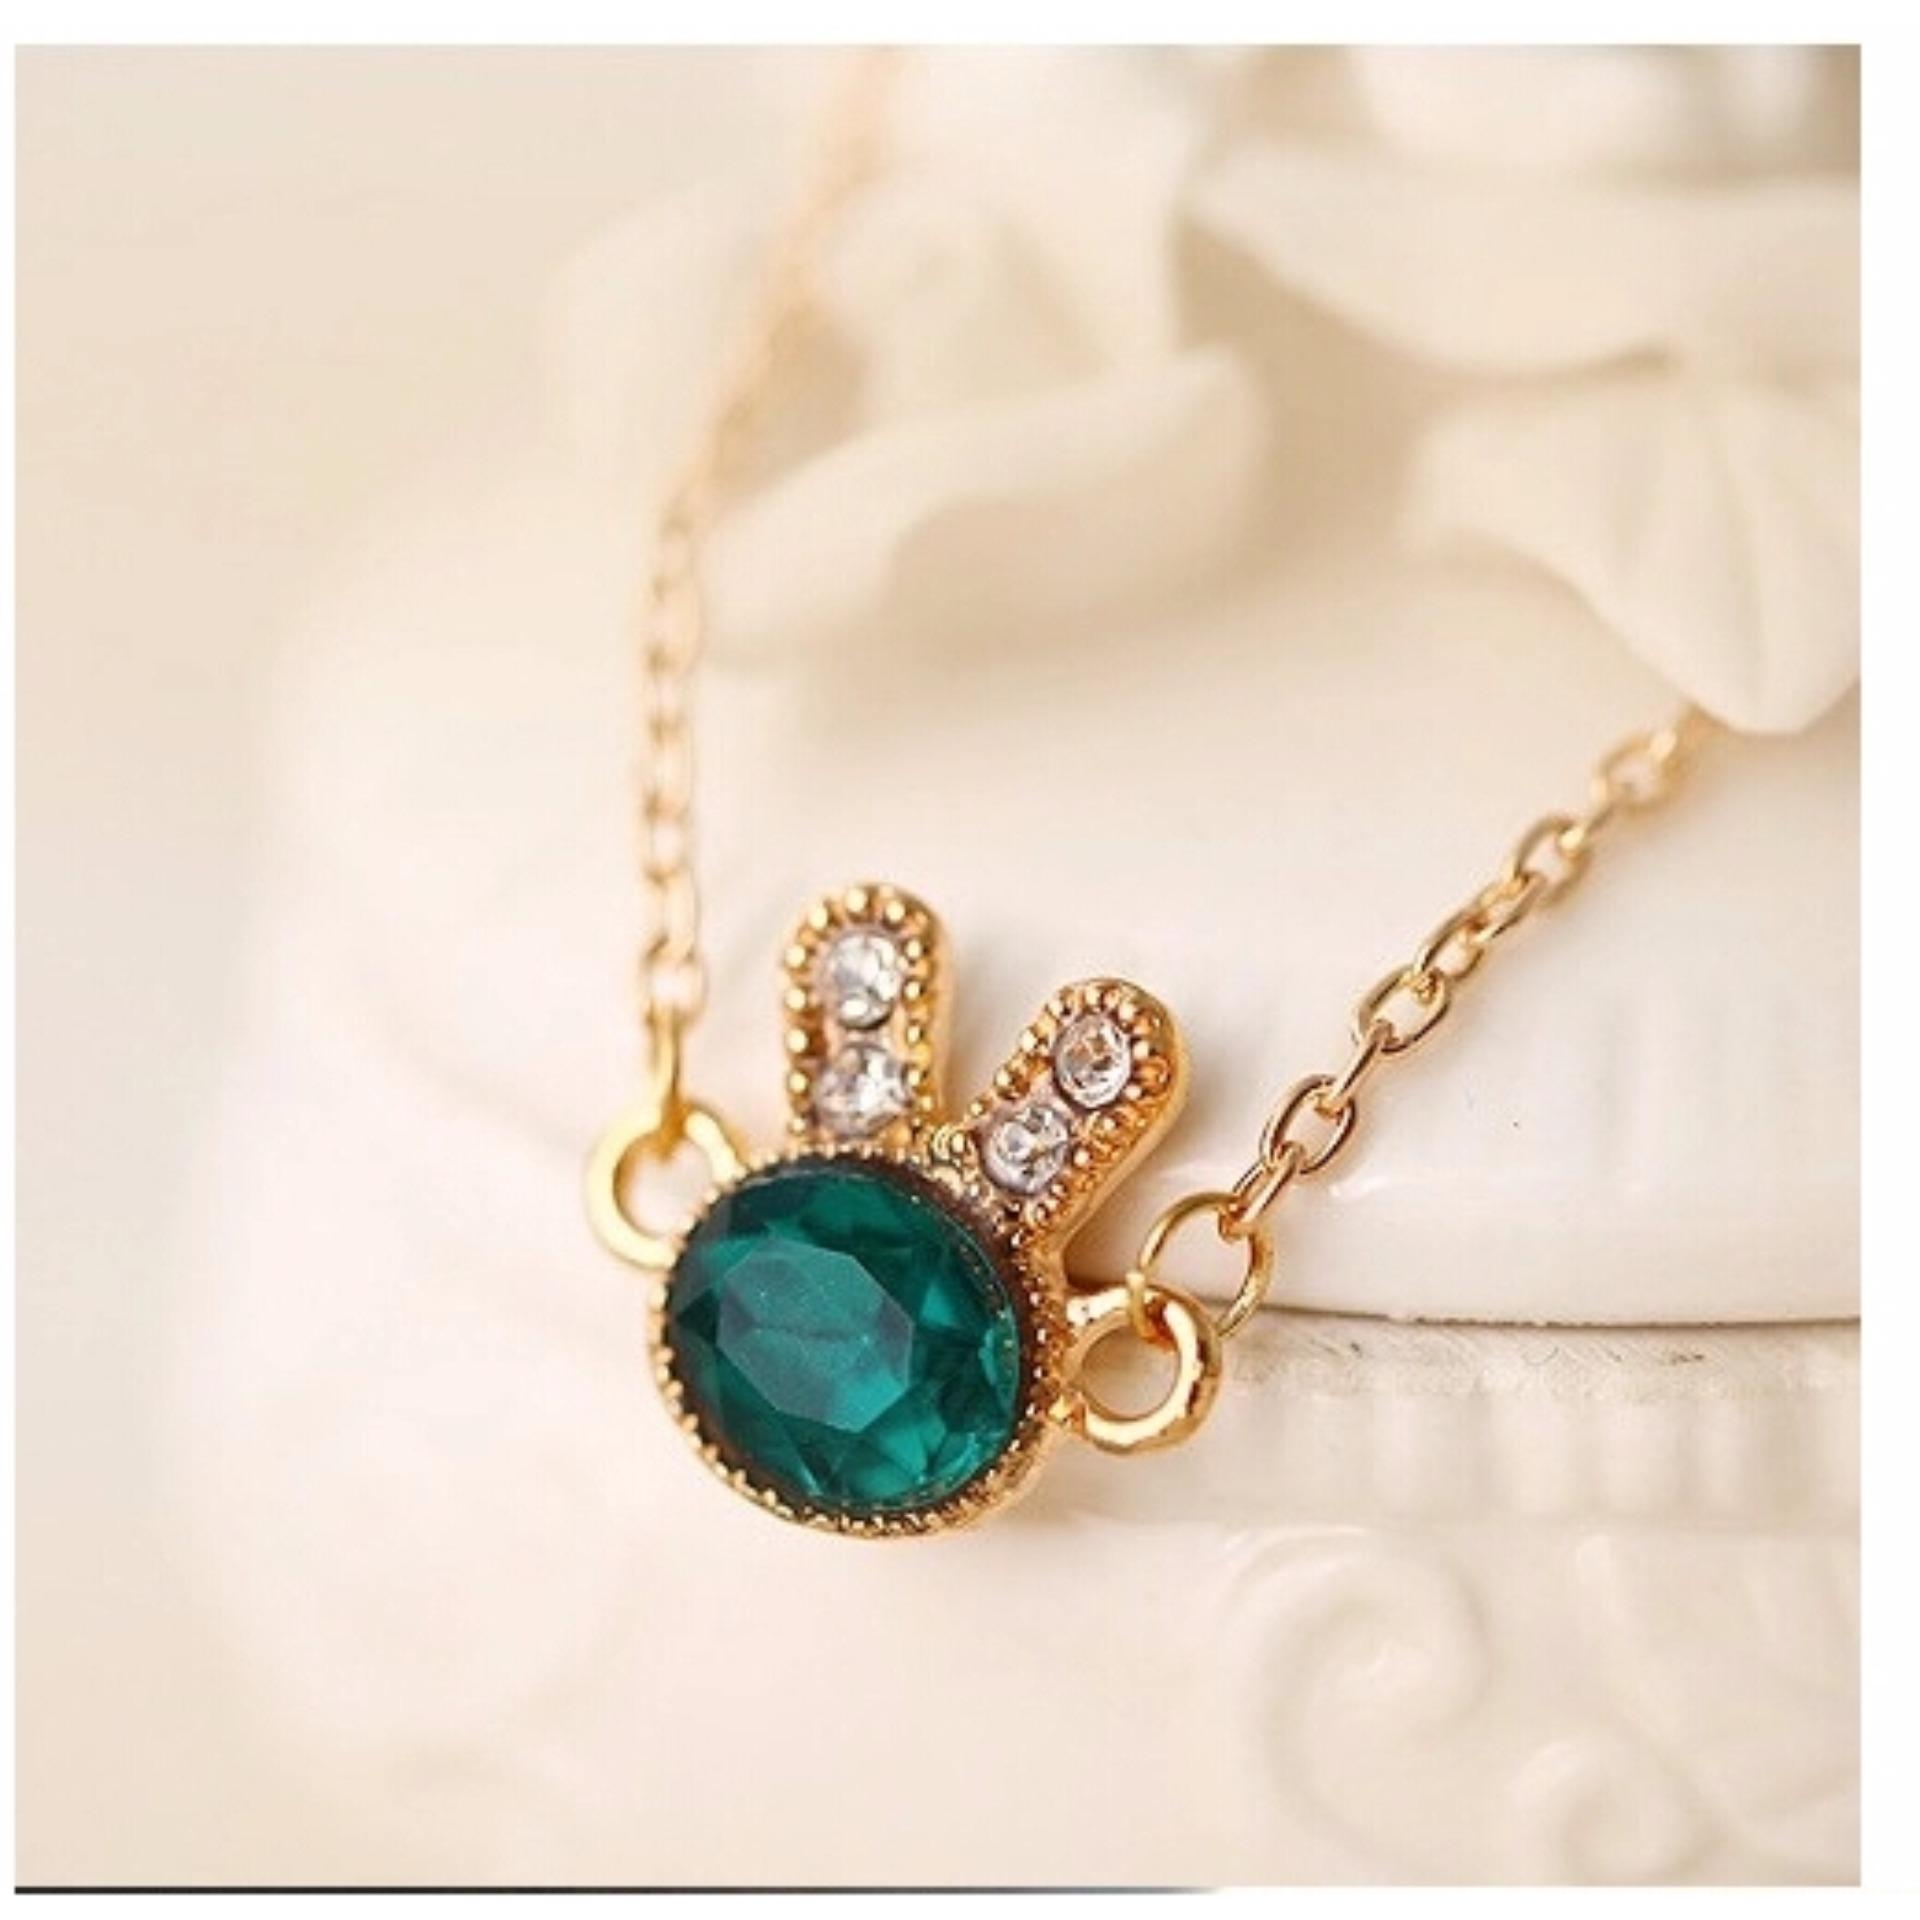 ... Amefurashi Gelang Kelinci Cutie Green Rabbit Ear Bracelet ...